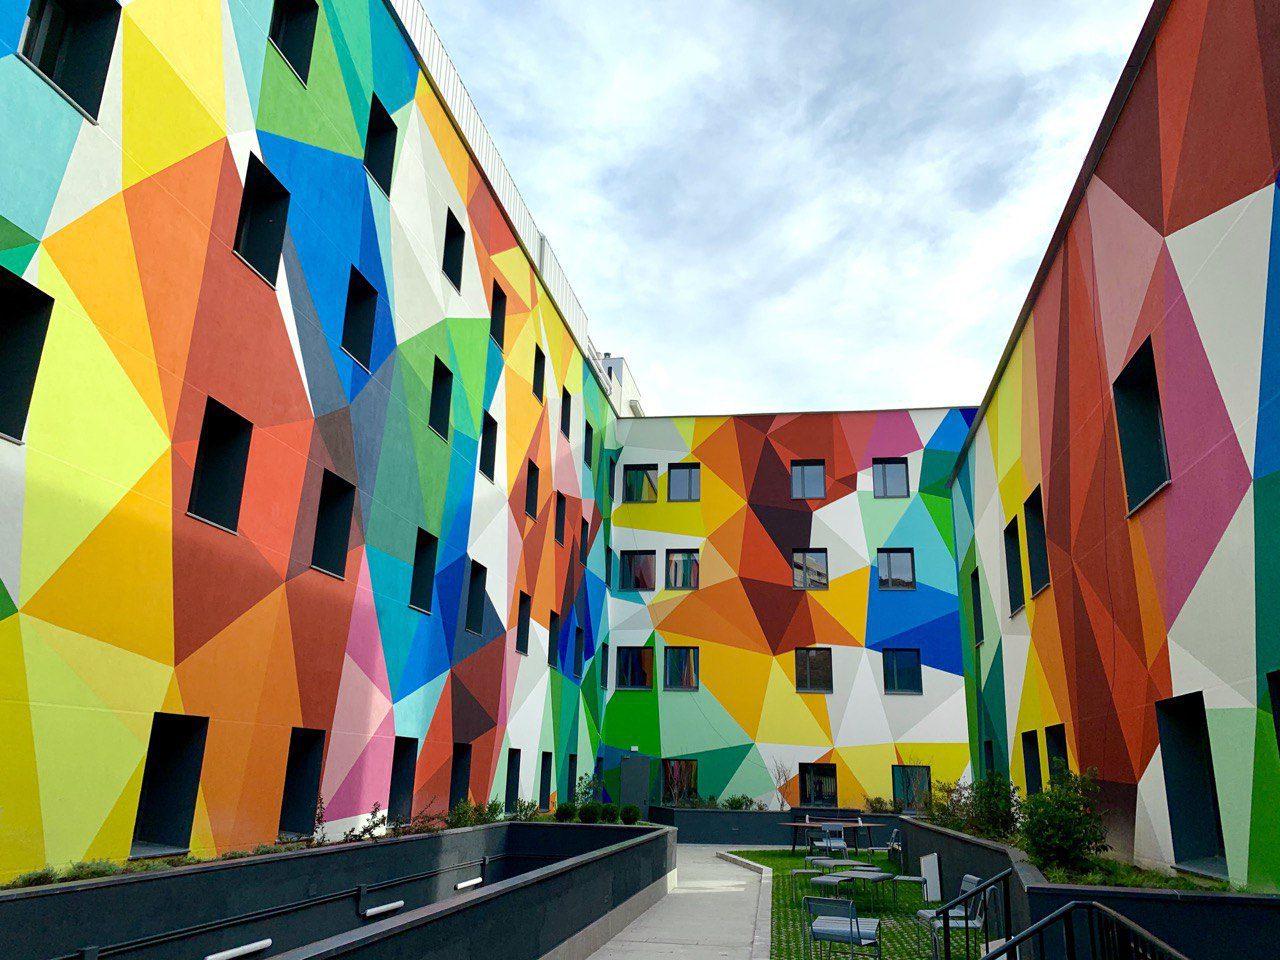 residencia estudiantes madrid fuente urbania